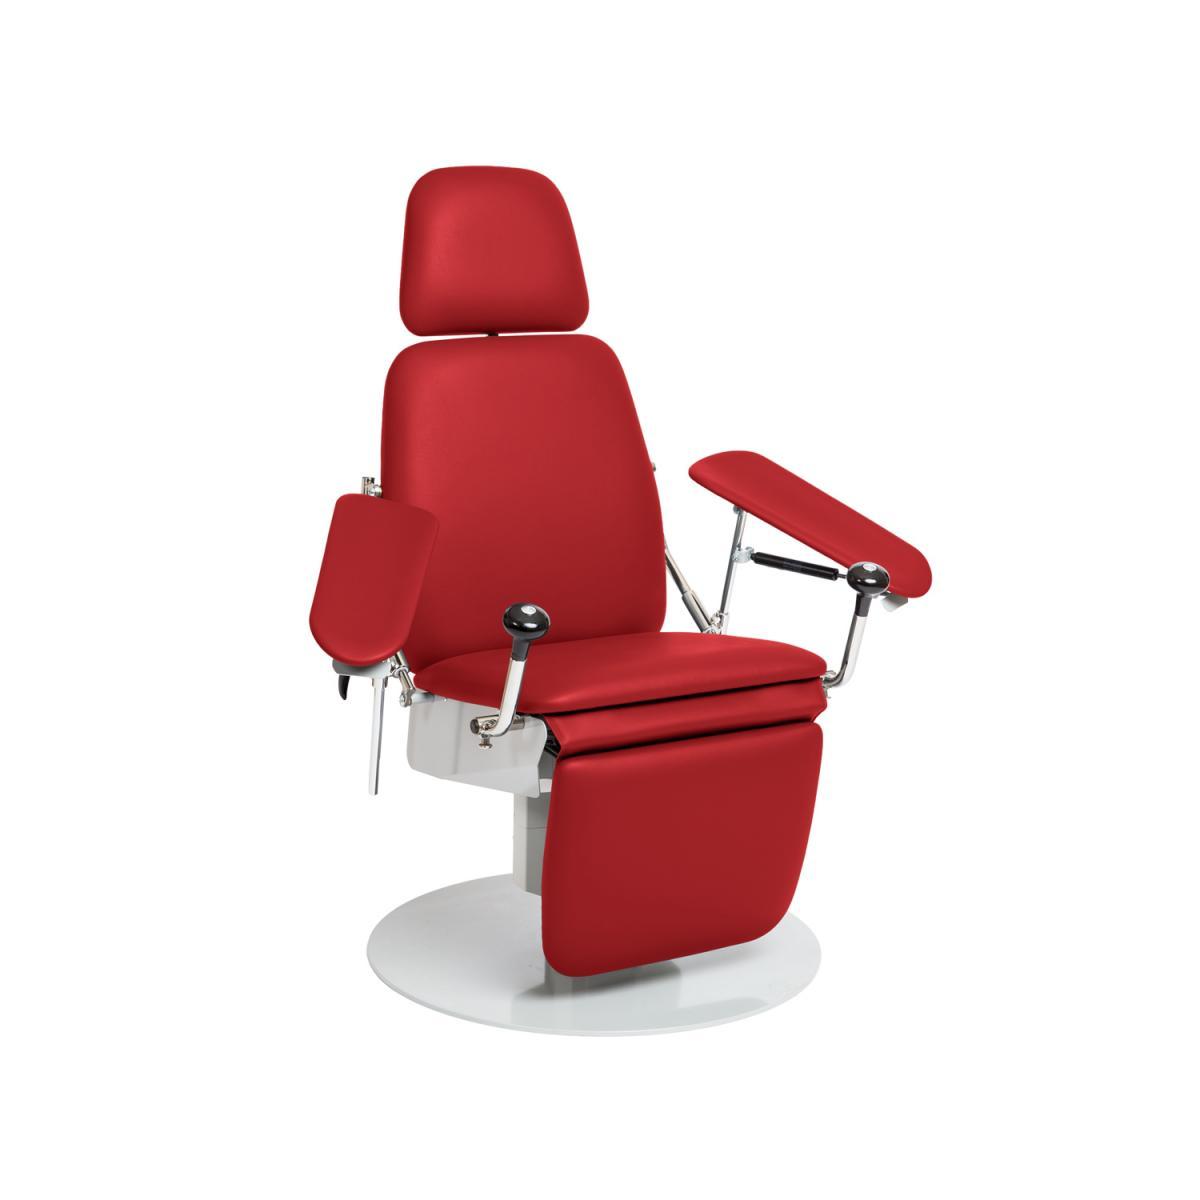 Sampling chair 710